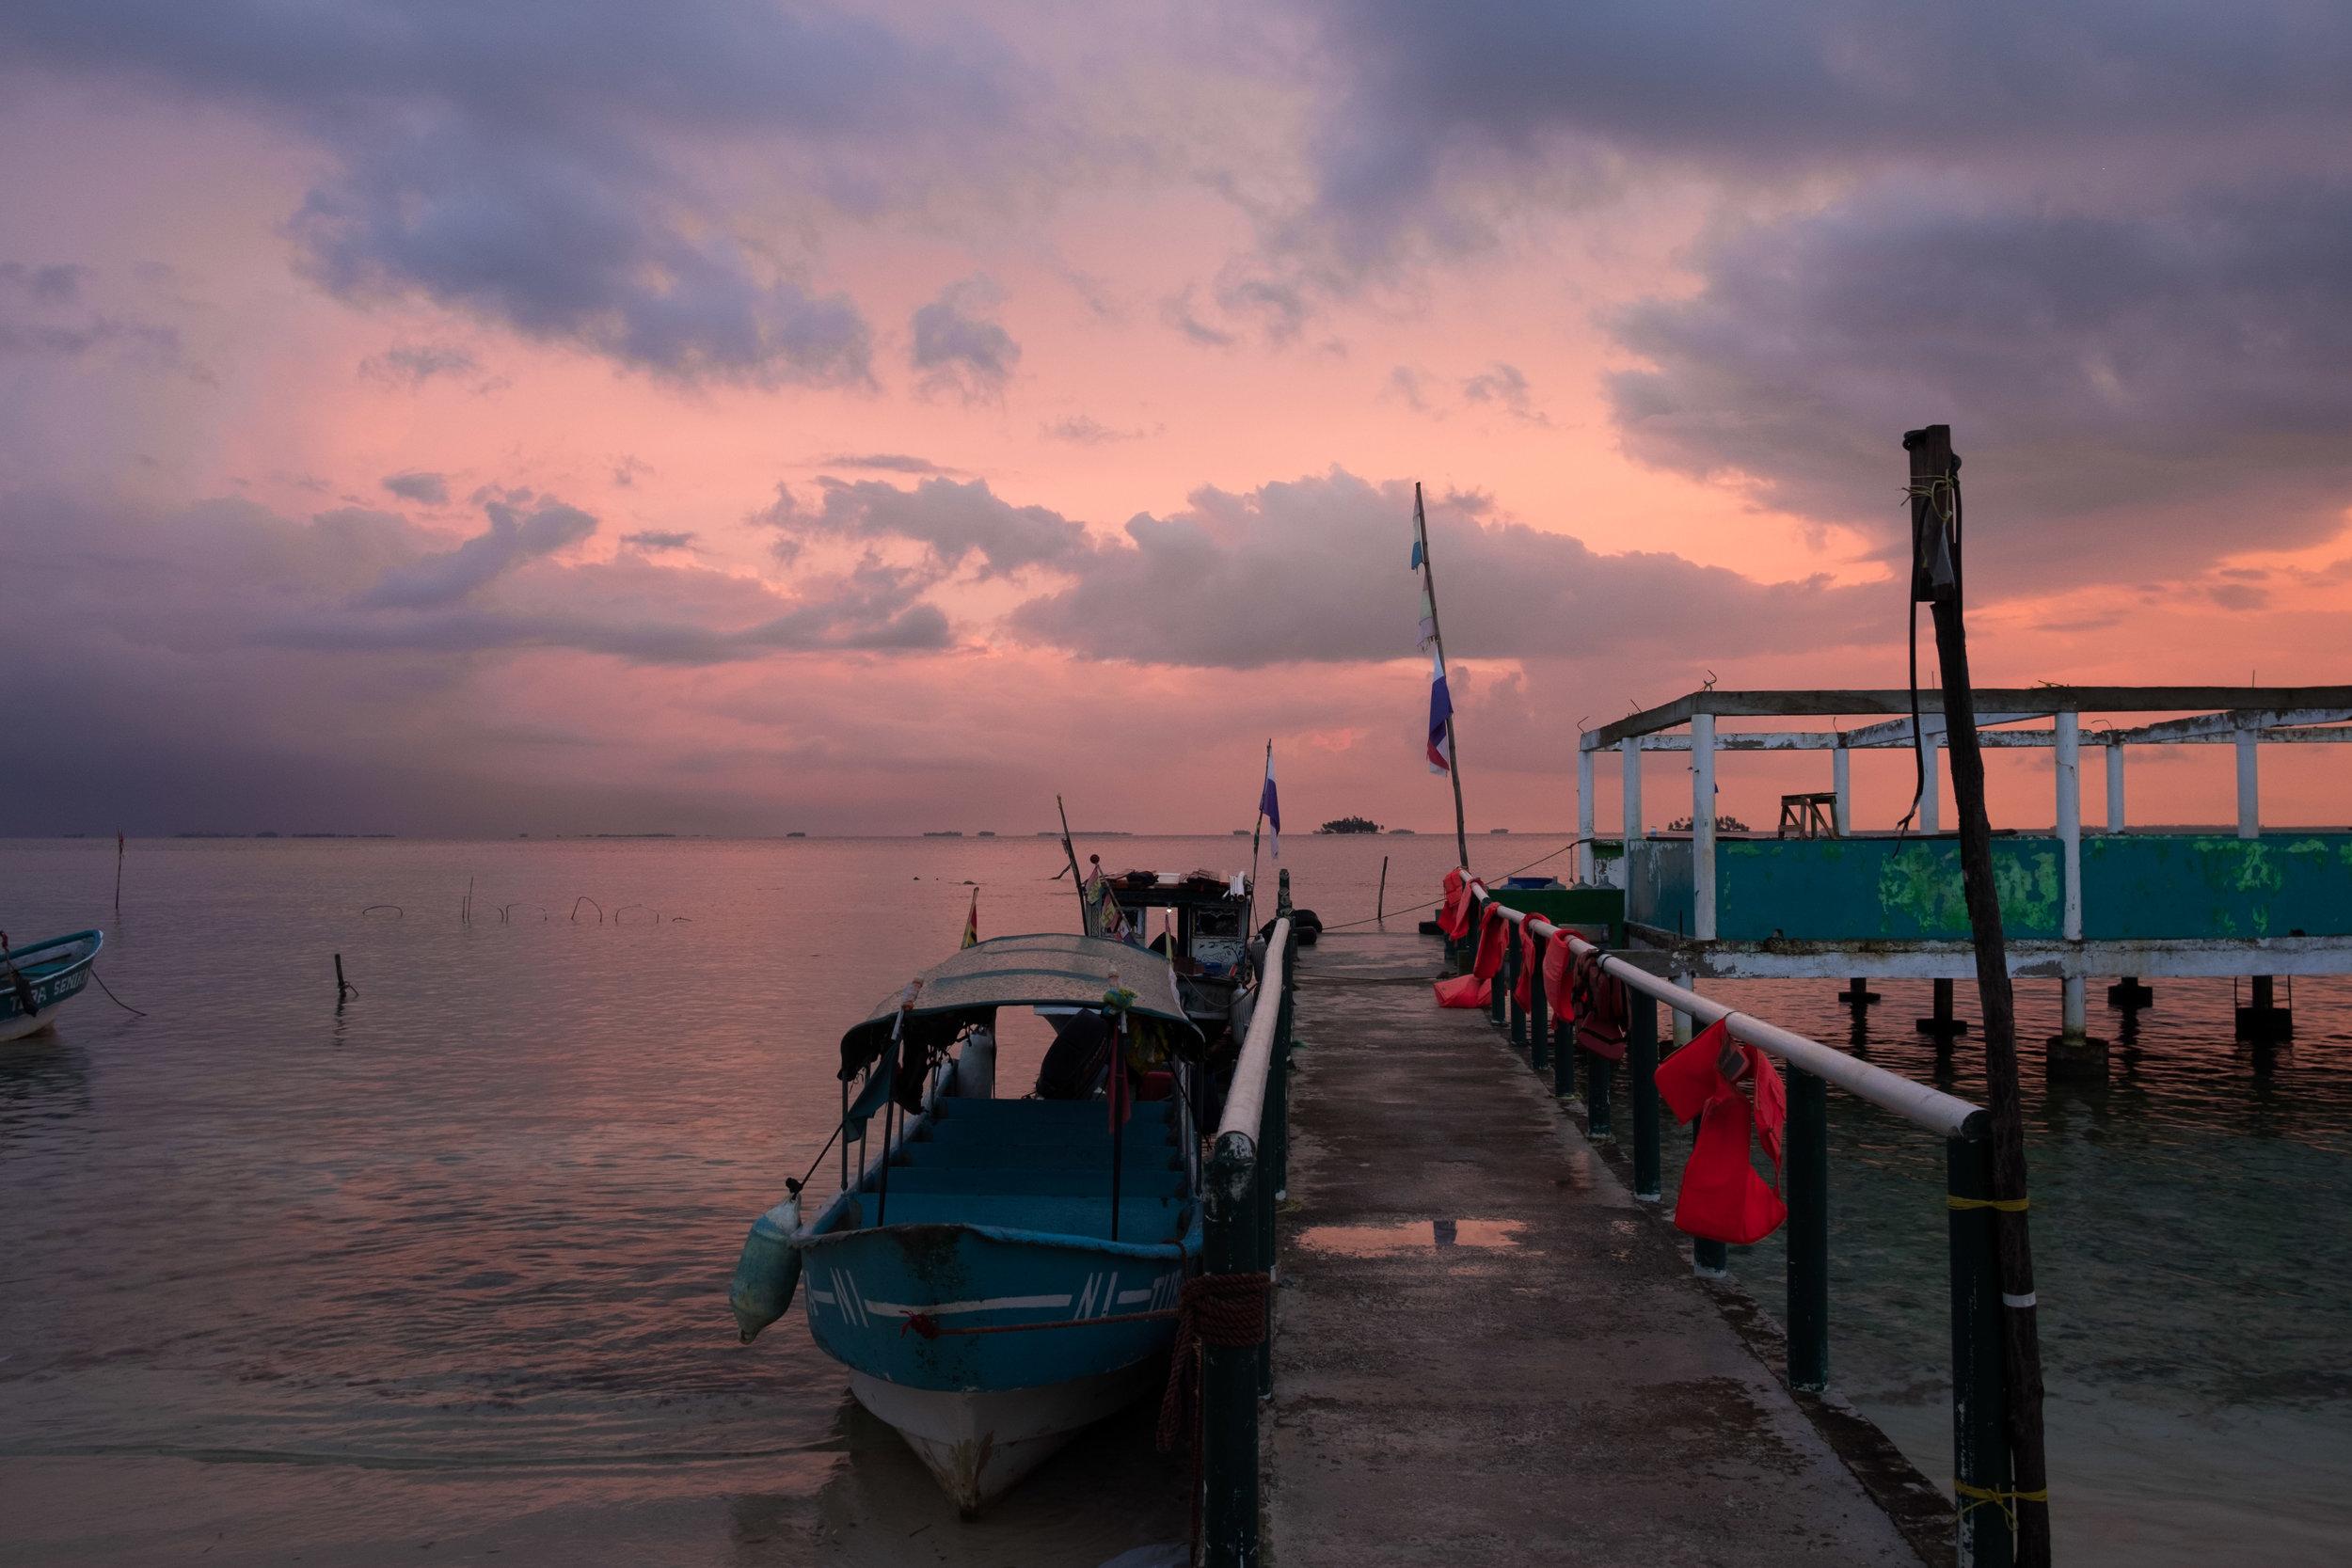 San Blas Panama sunrise boats